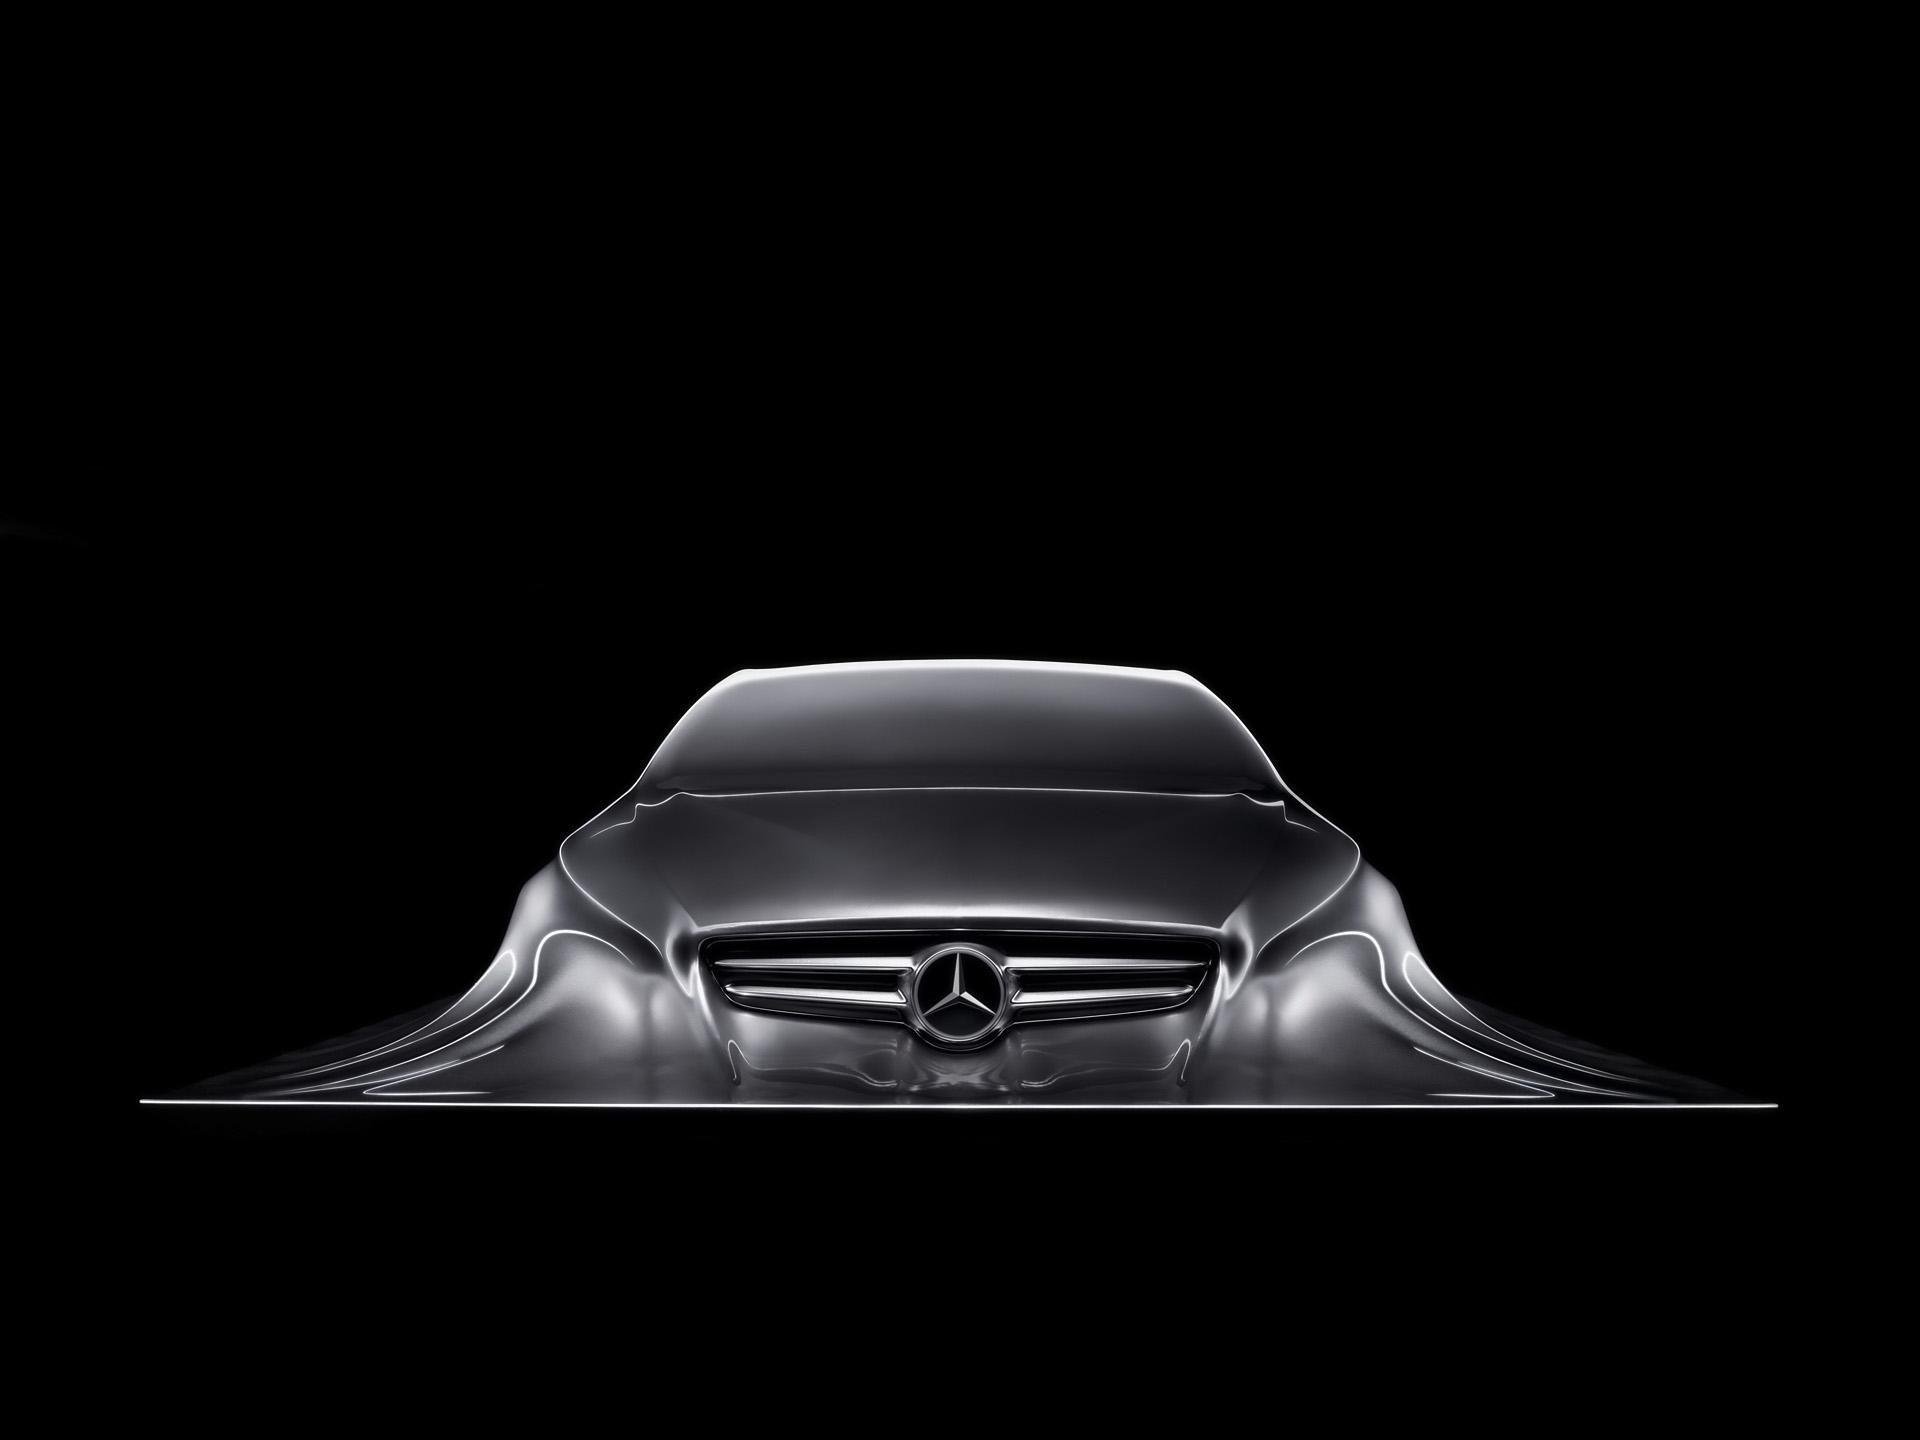 Mercedes Benz Logo Wallpapers - WallpaperSafari